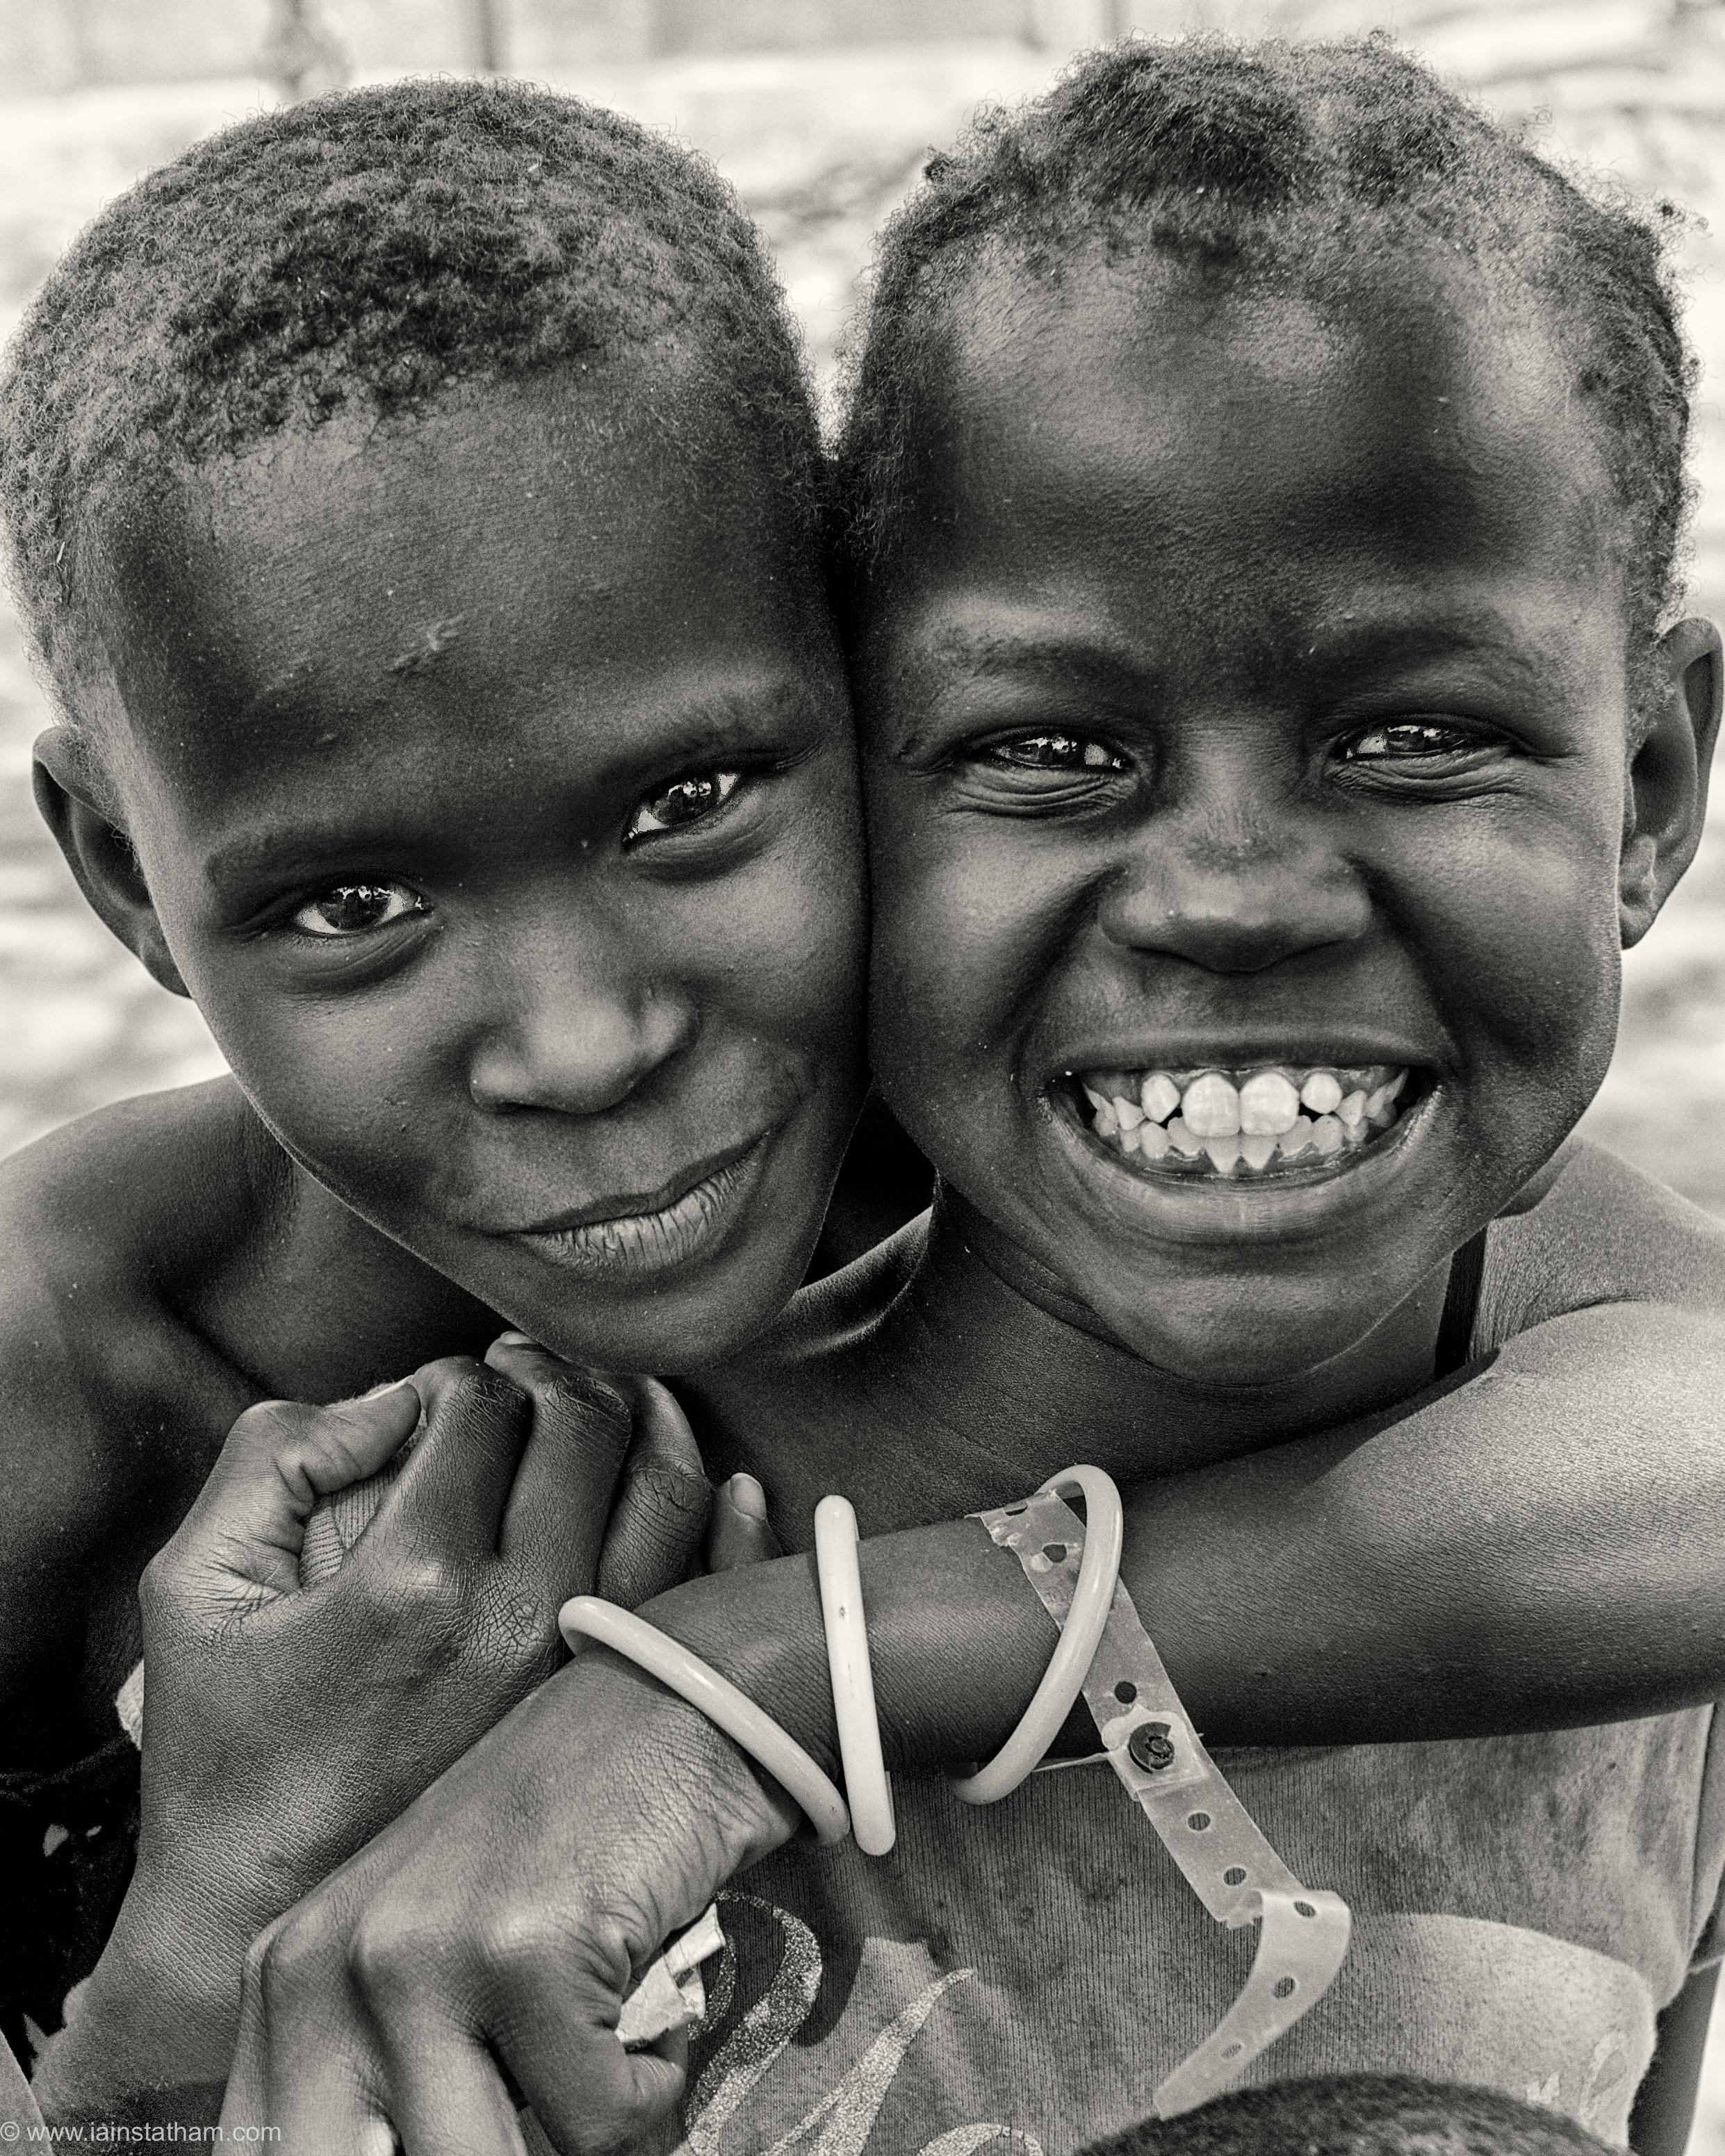 ug - south sudan refugees - dziapi - bw-25.jpg